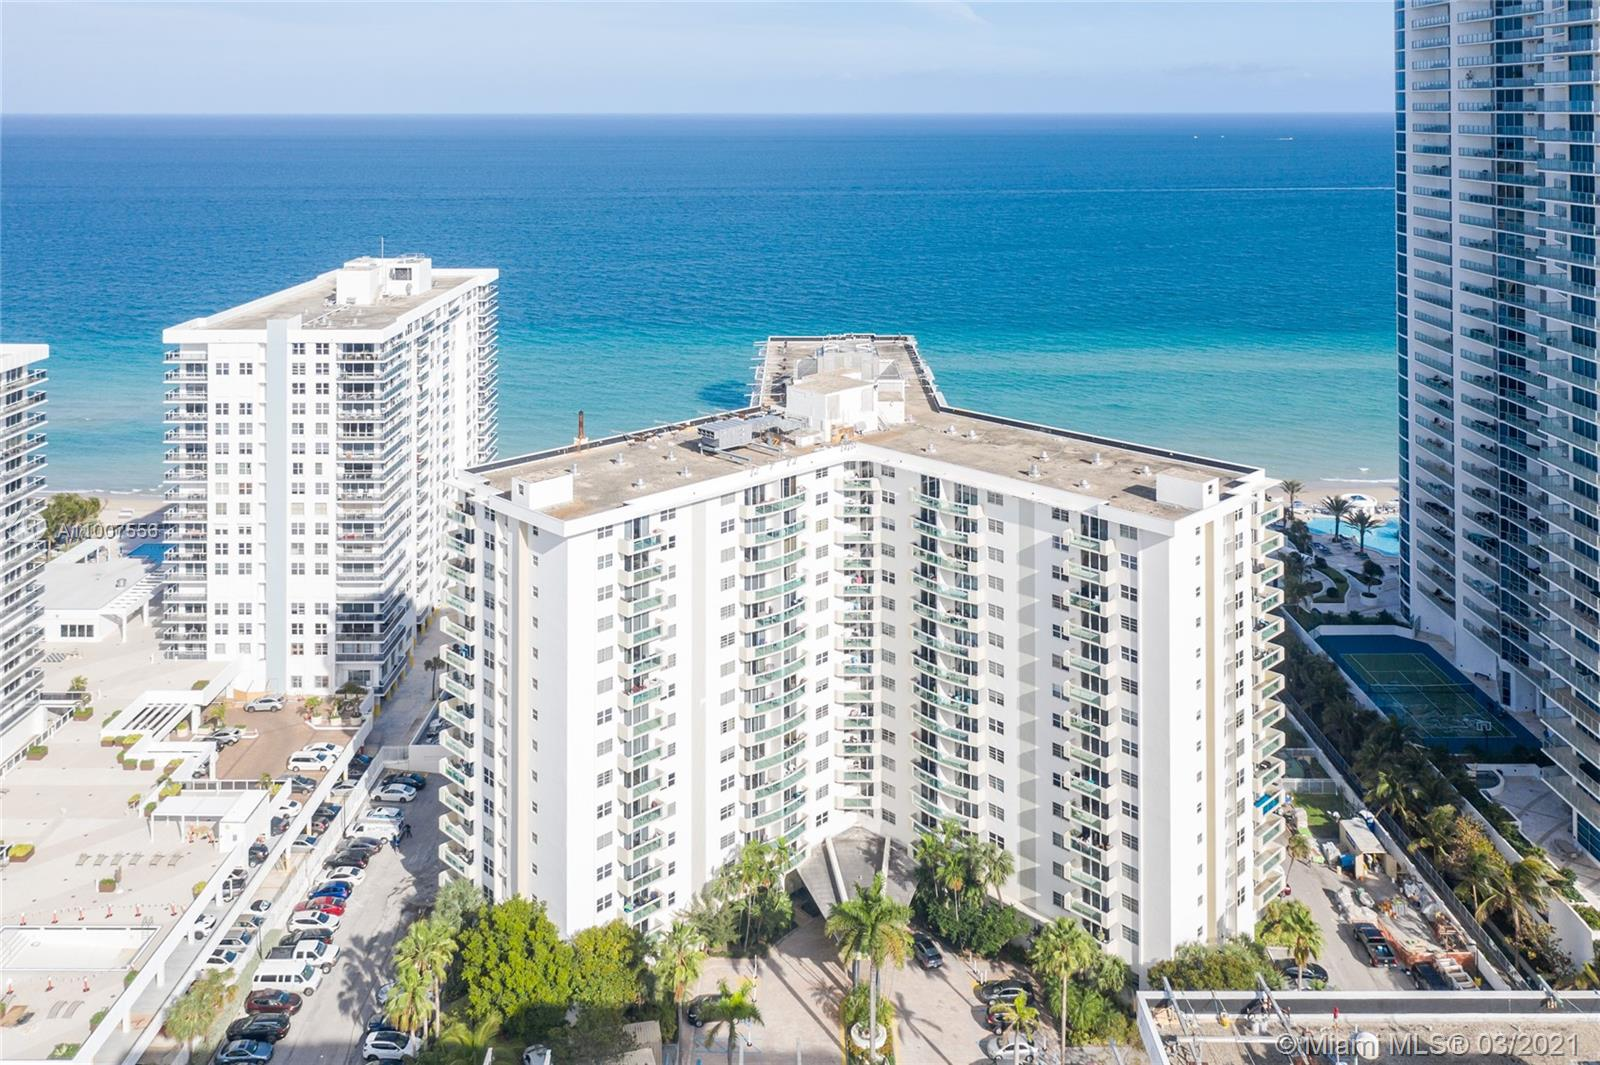 The Residences On Hollywood Beach image #1